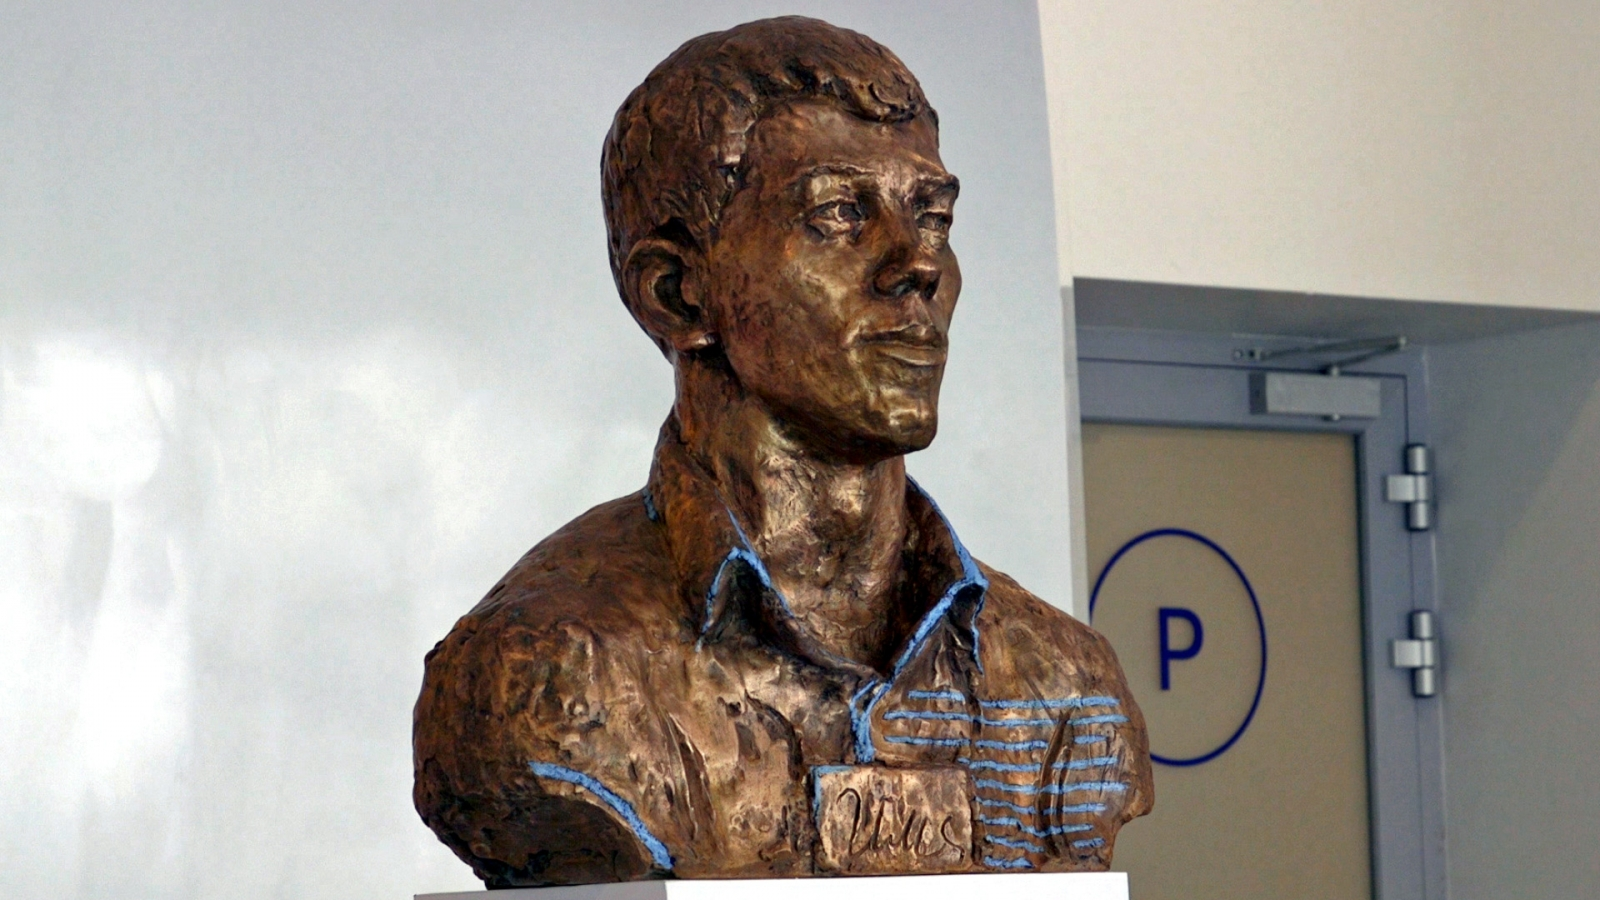 Bronze bust of Yandex co-founder Ilya Segalovich